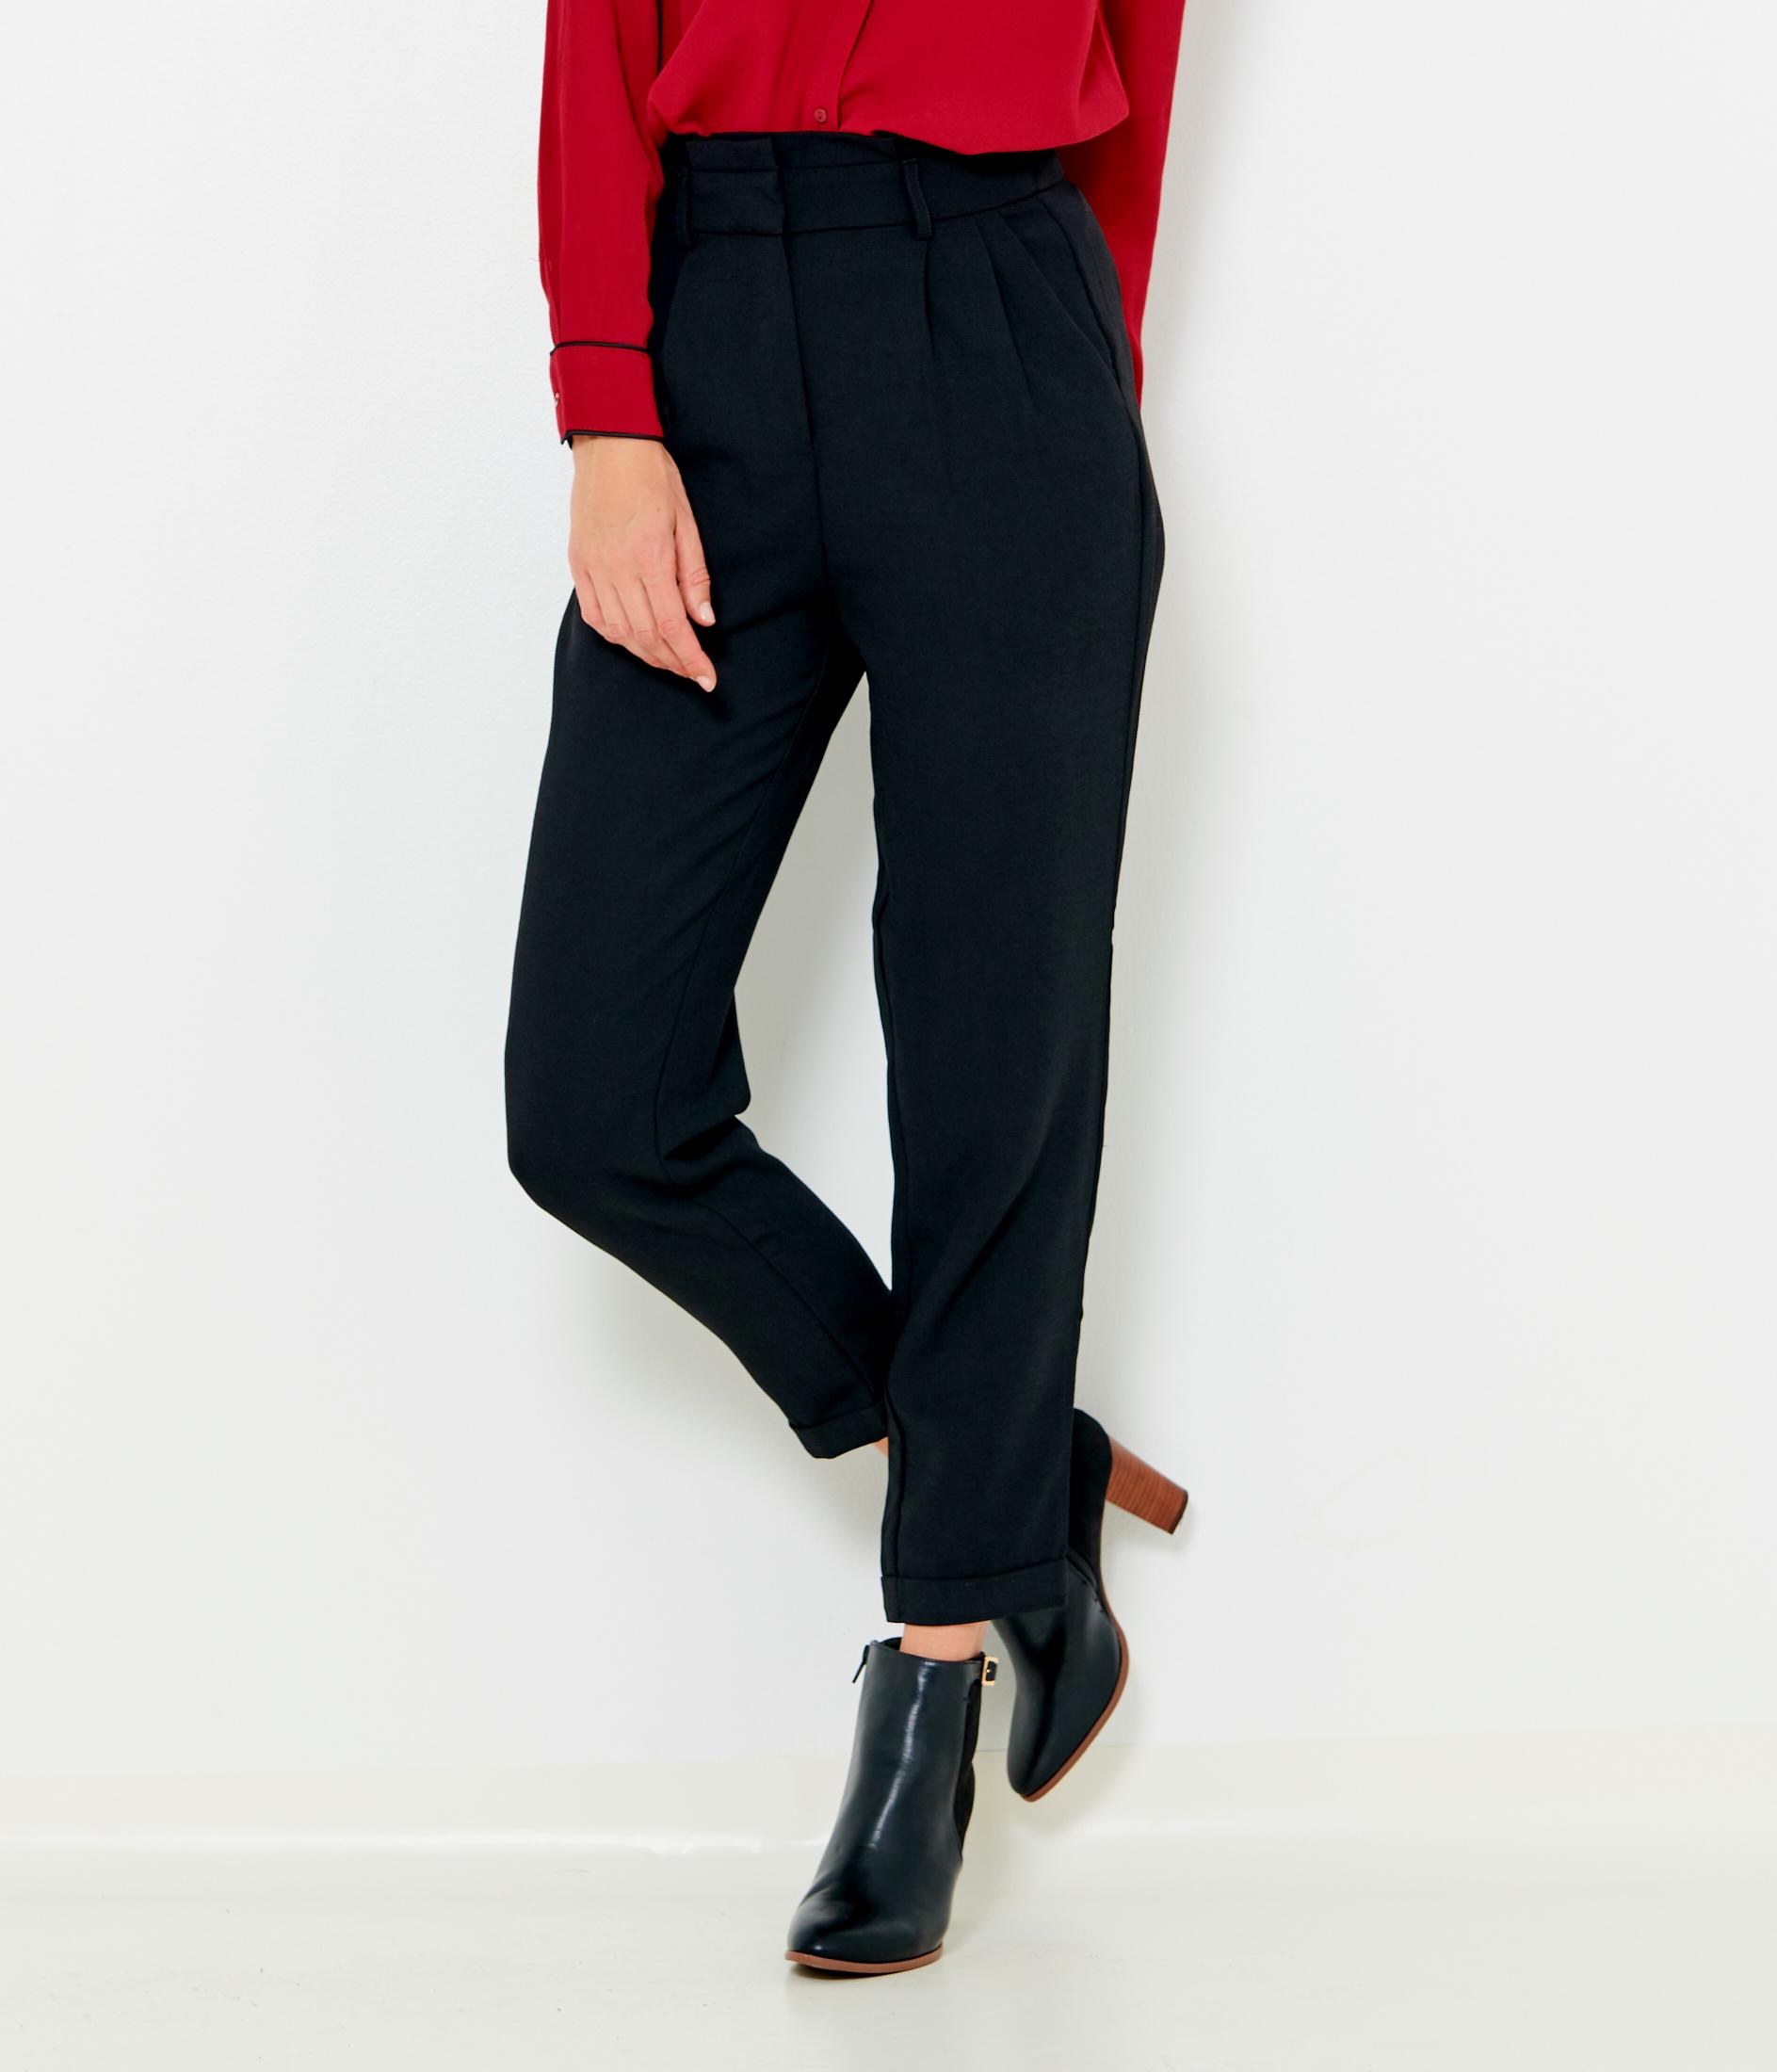 Pantalon En Crêpe Camaïeu Femme Carotte SVzGUMqp